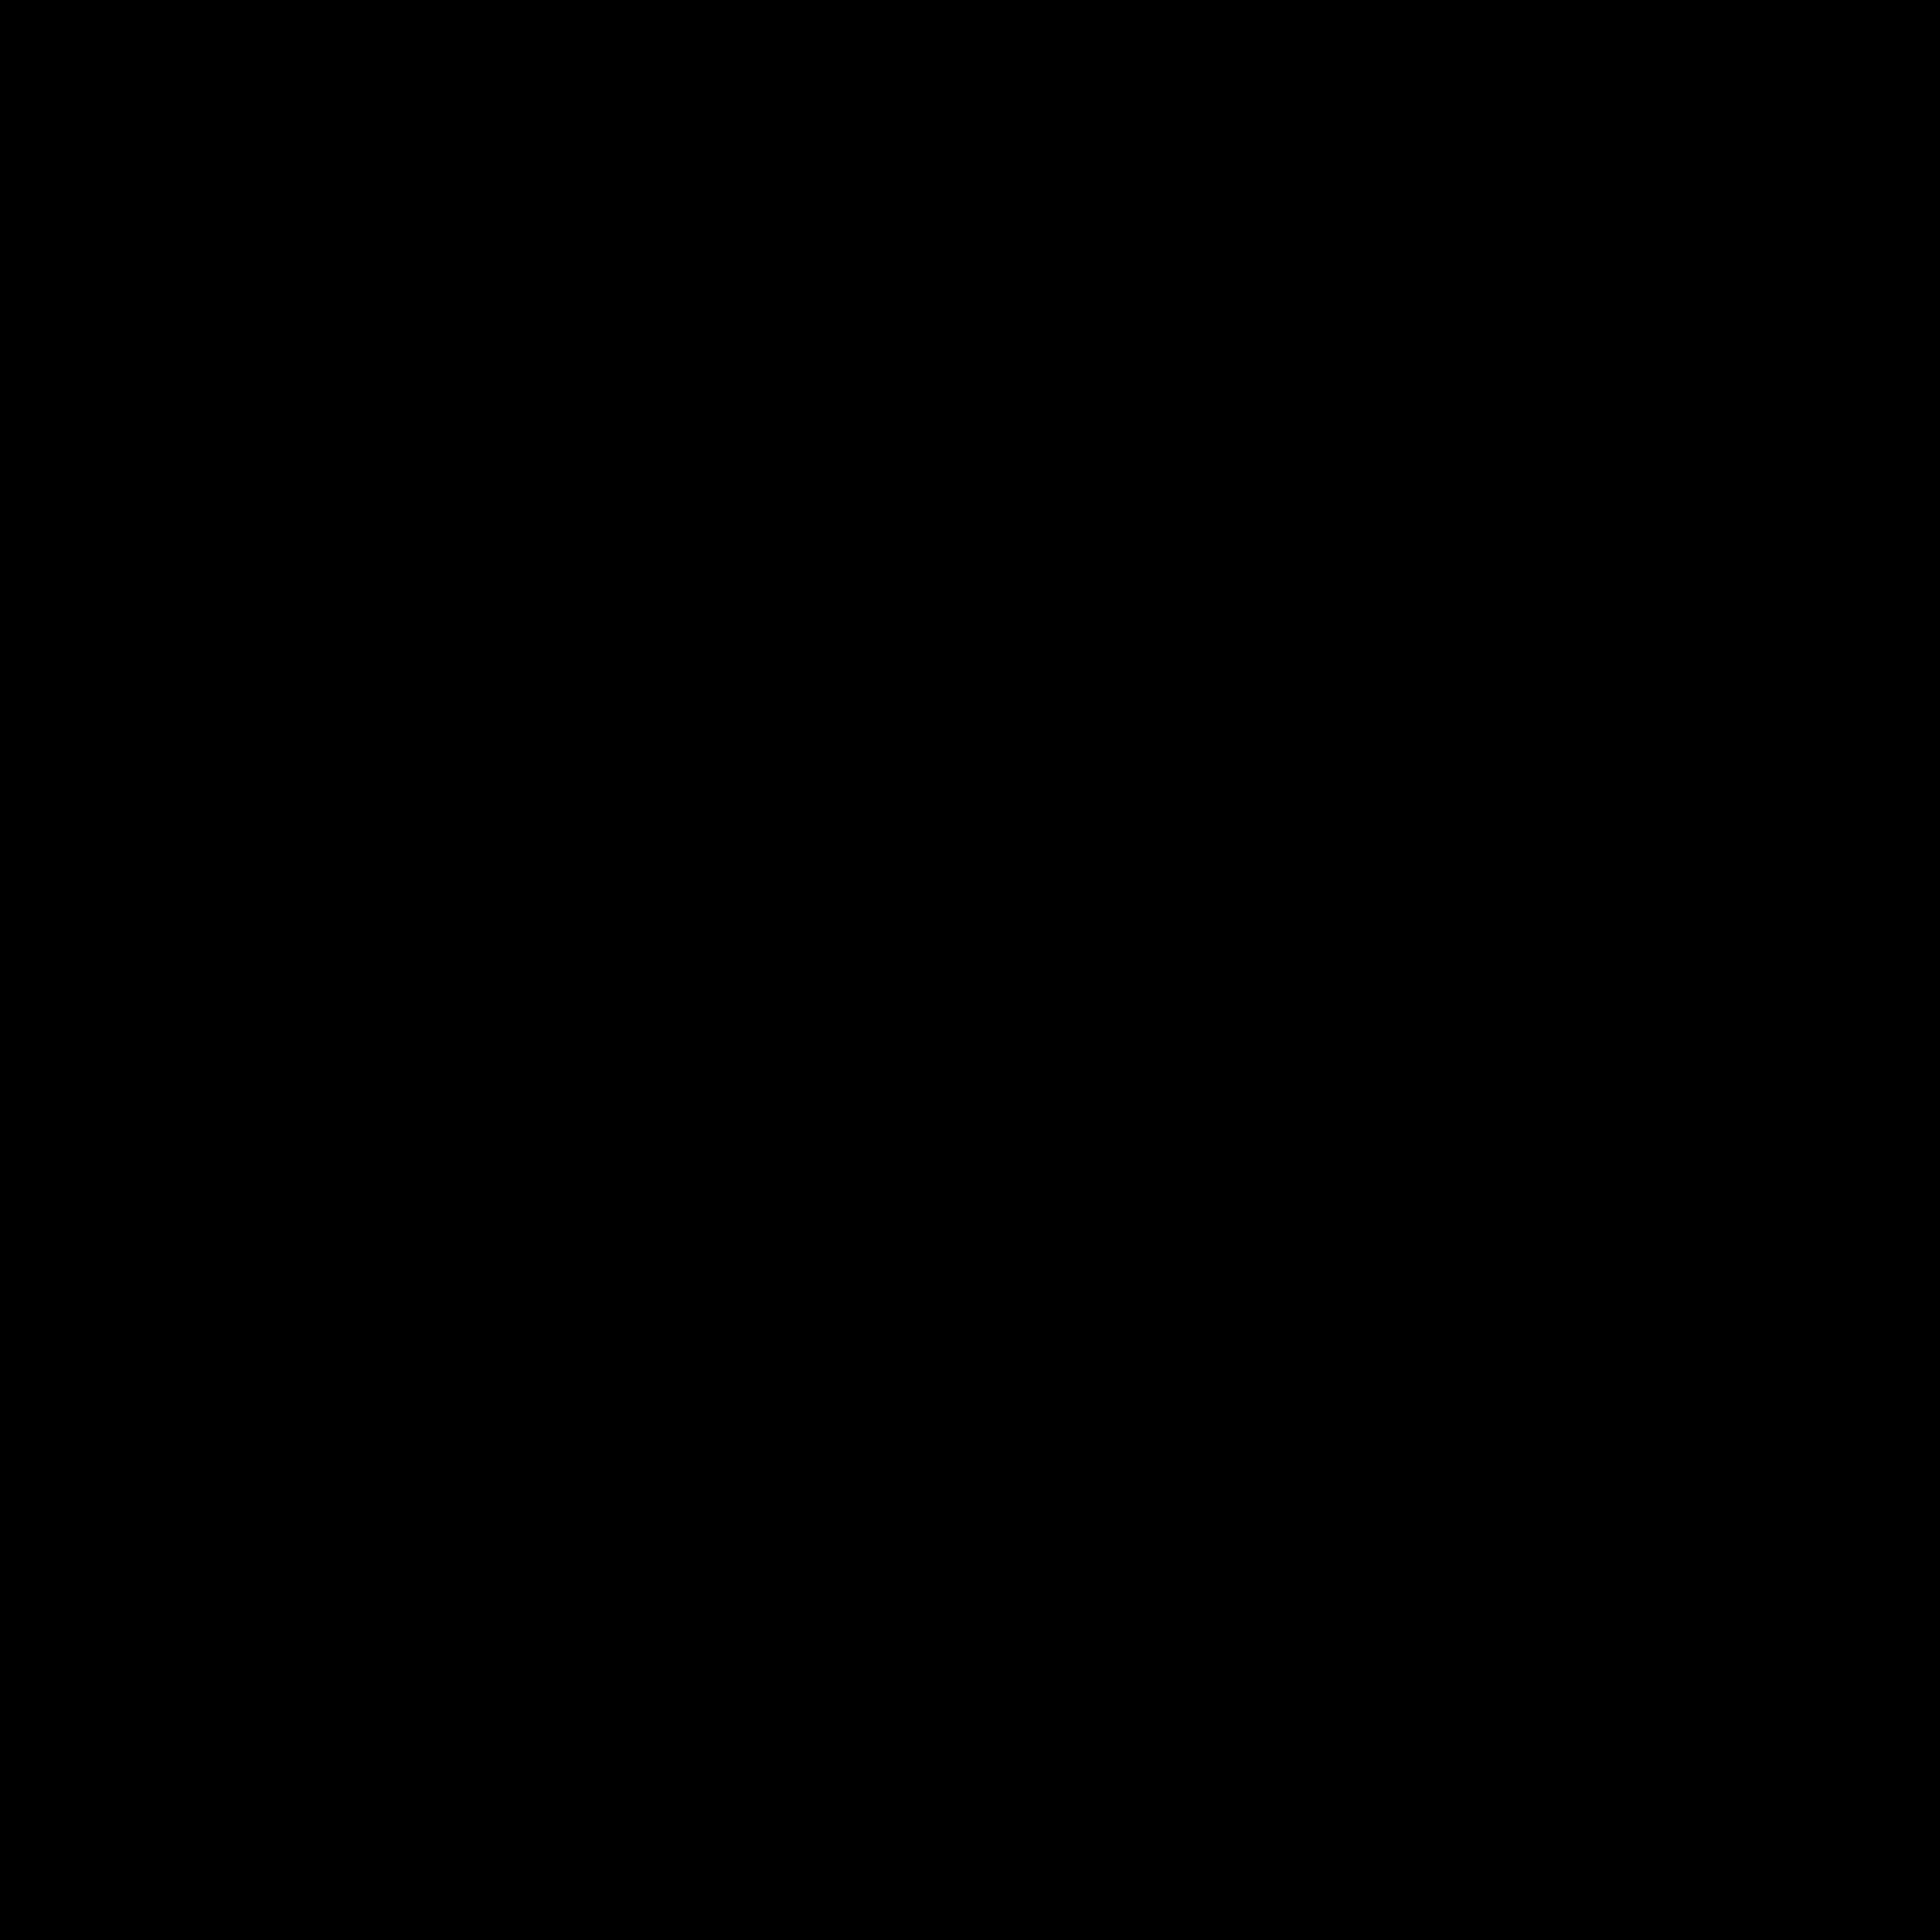 Annonce Sexe & Plan Cul Brive-la-Gaillarde (19100)